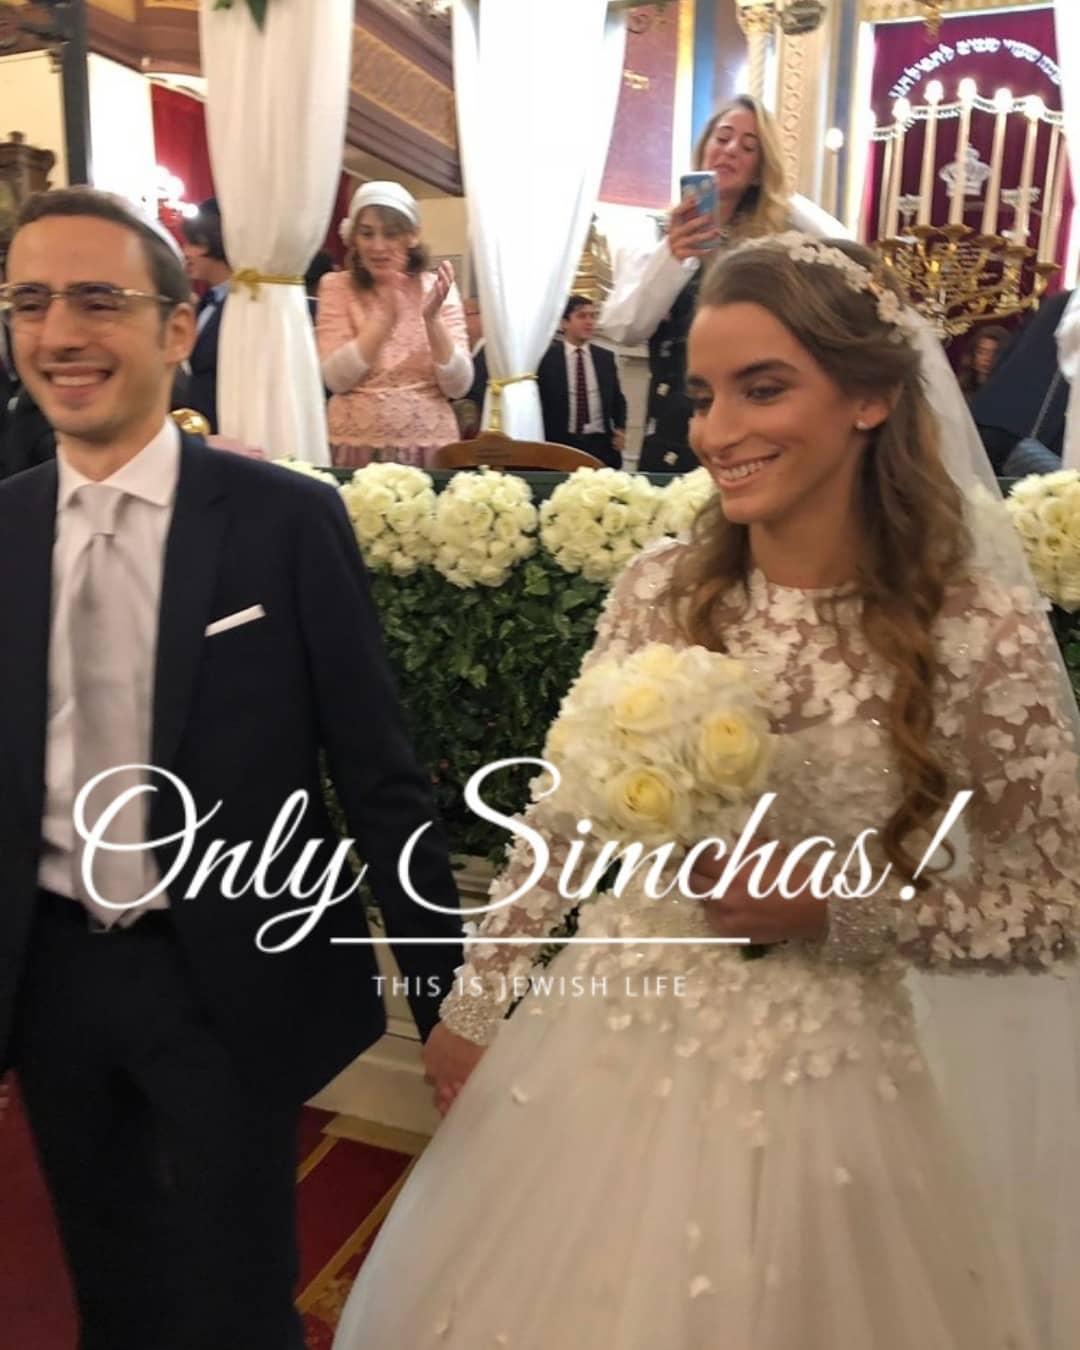 Wedding Jessica Darmon and David Abissera (#Paris)! #Onlysimchas